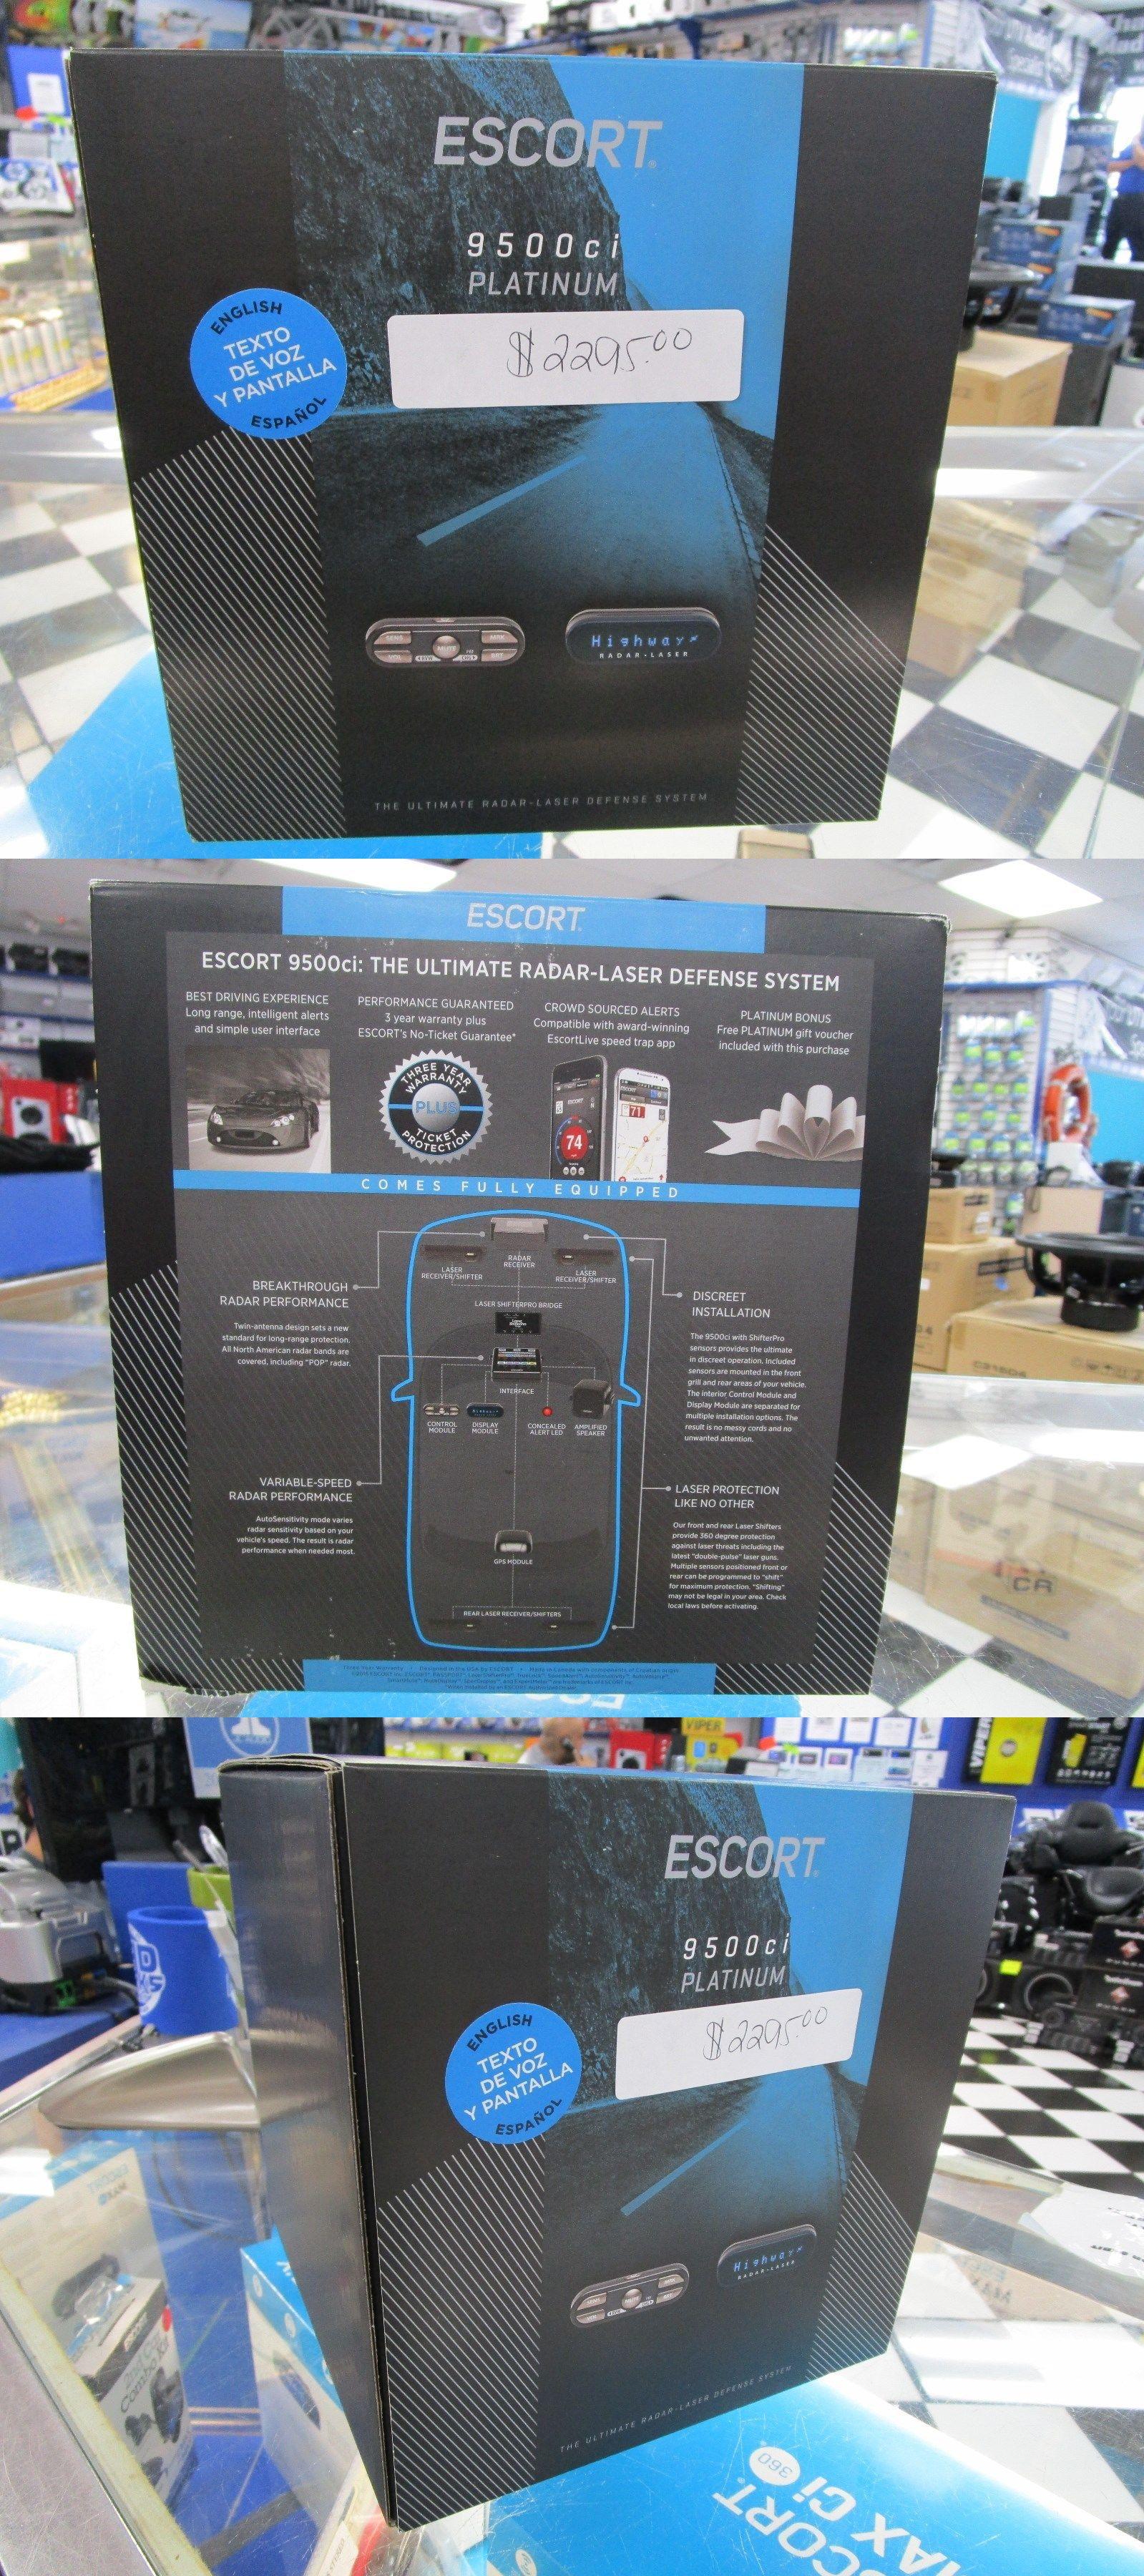 Radar and Laser Detectors: Escort Passport 9500Ci-Platinum Radar Detector W  4) Laser Shifter Pro Brand New -> BUY IT NOW ONLY: $1699.95 on eBay!&#8221;/></a></p> <h2>Film Radar Projection</h2> <p><iframe height=481 width=608 src=